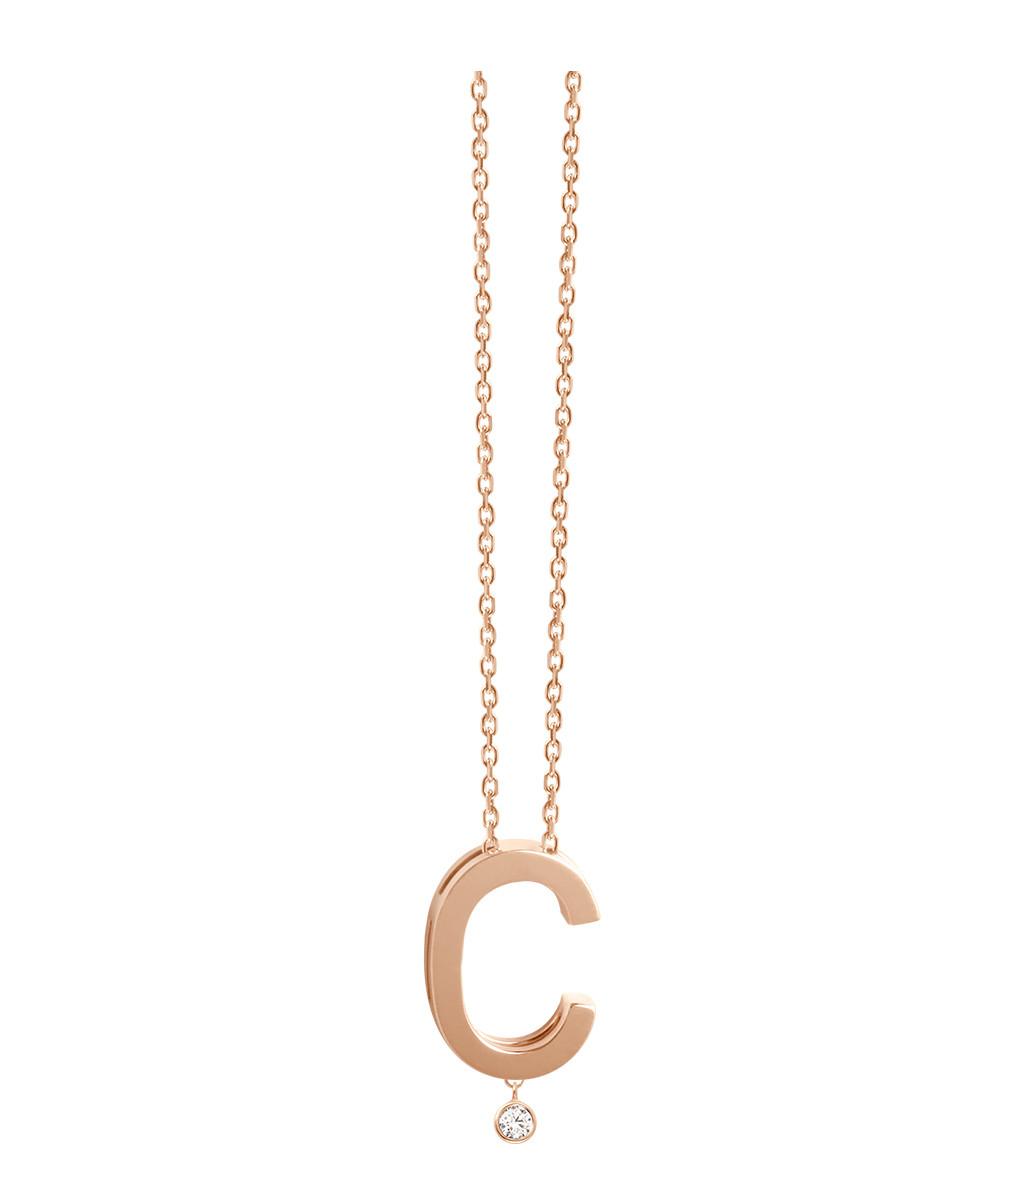 VANRYCKE - Collier Abécédaire Or Rose Diamant